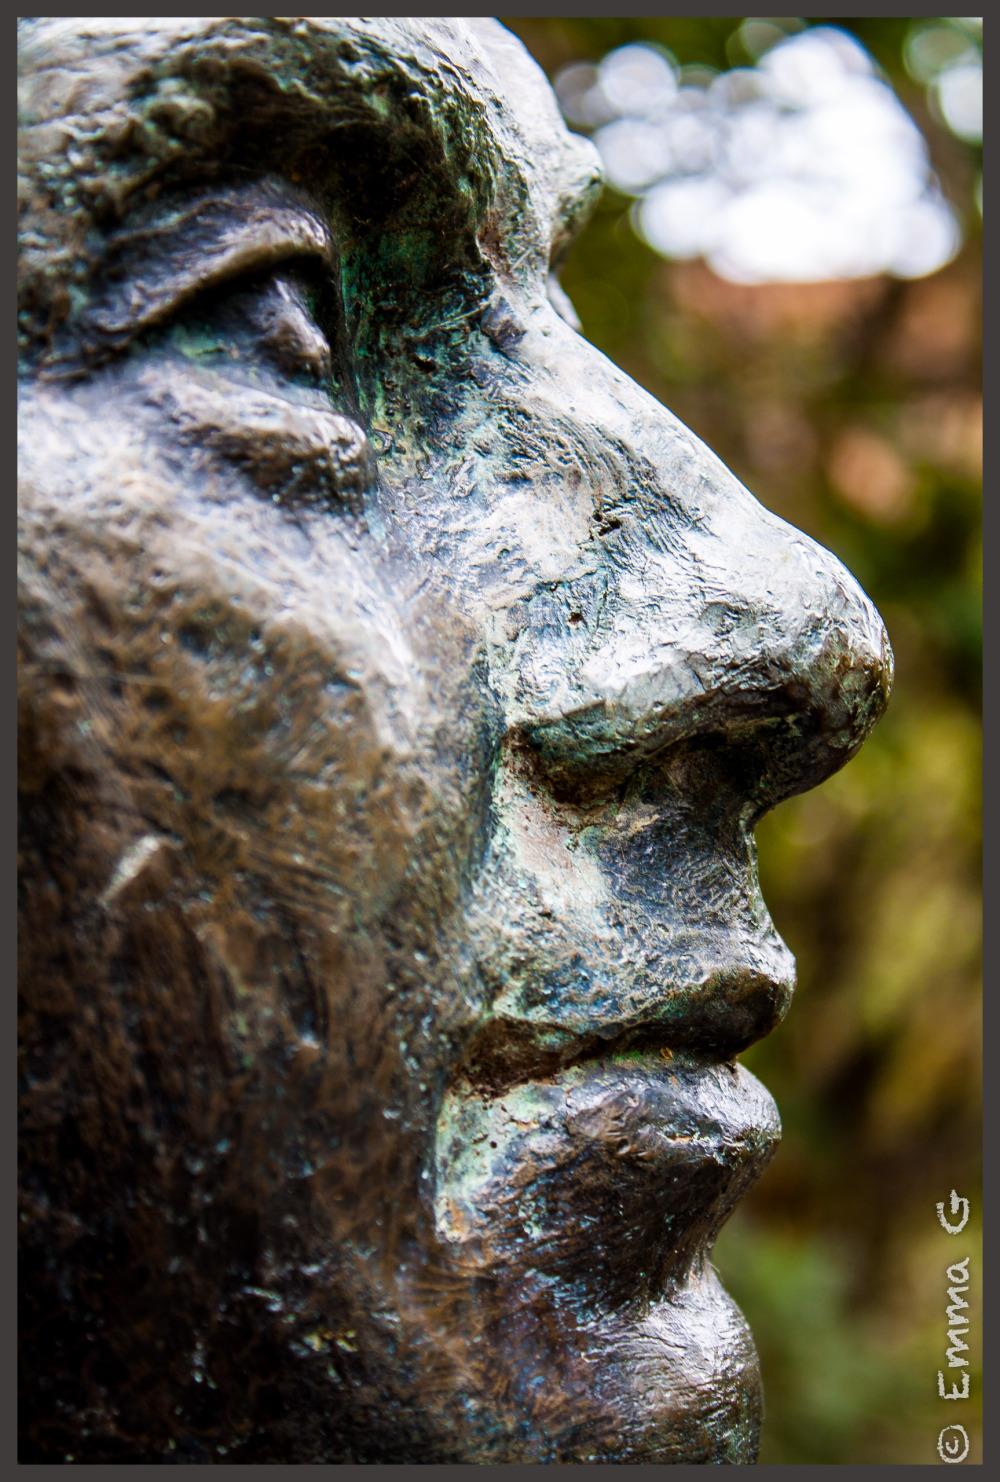 Statue at Canberra's Botanical Garden